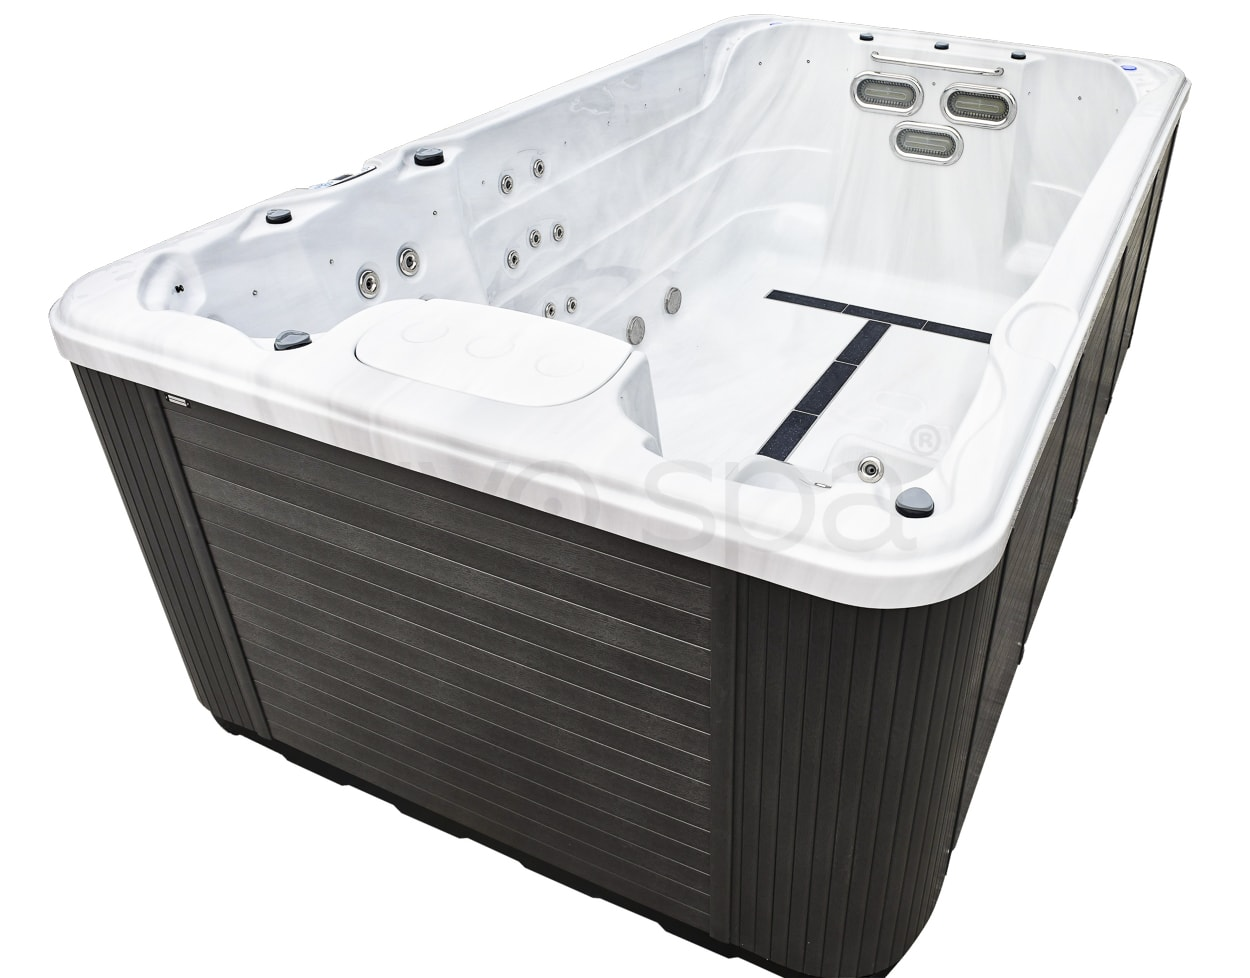 vivo-spa-WaterFit-1-Swim-Spa-Seite